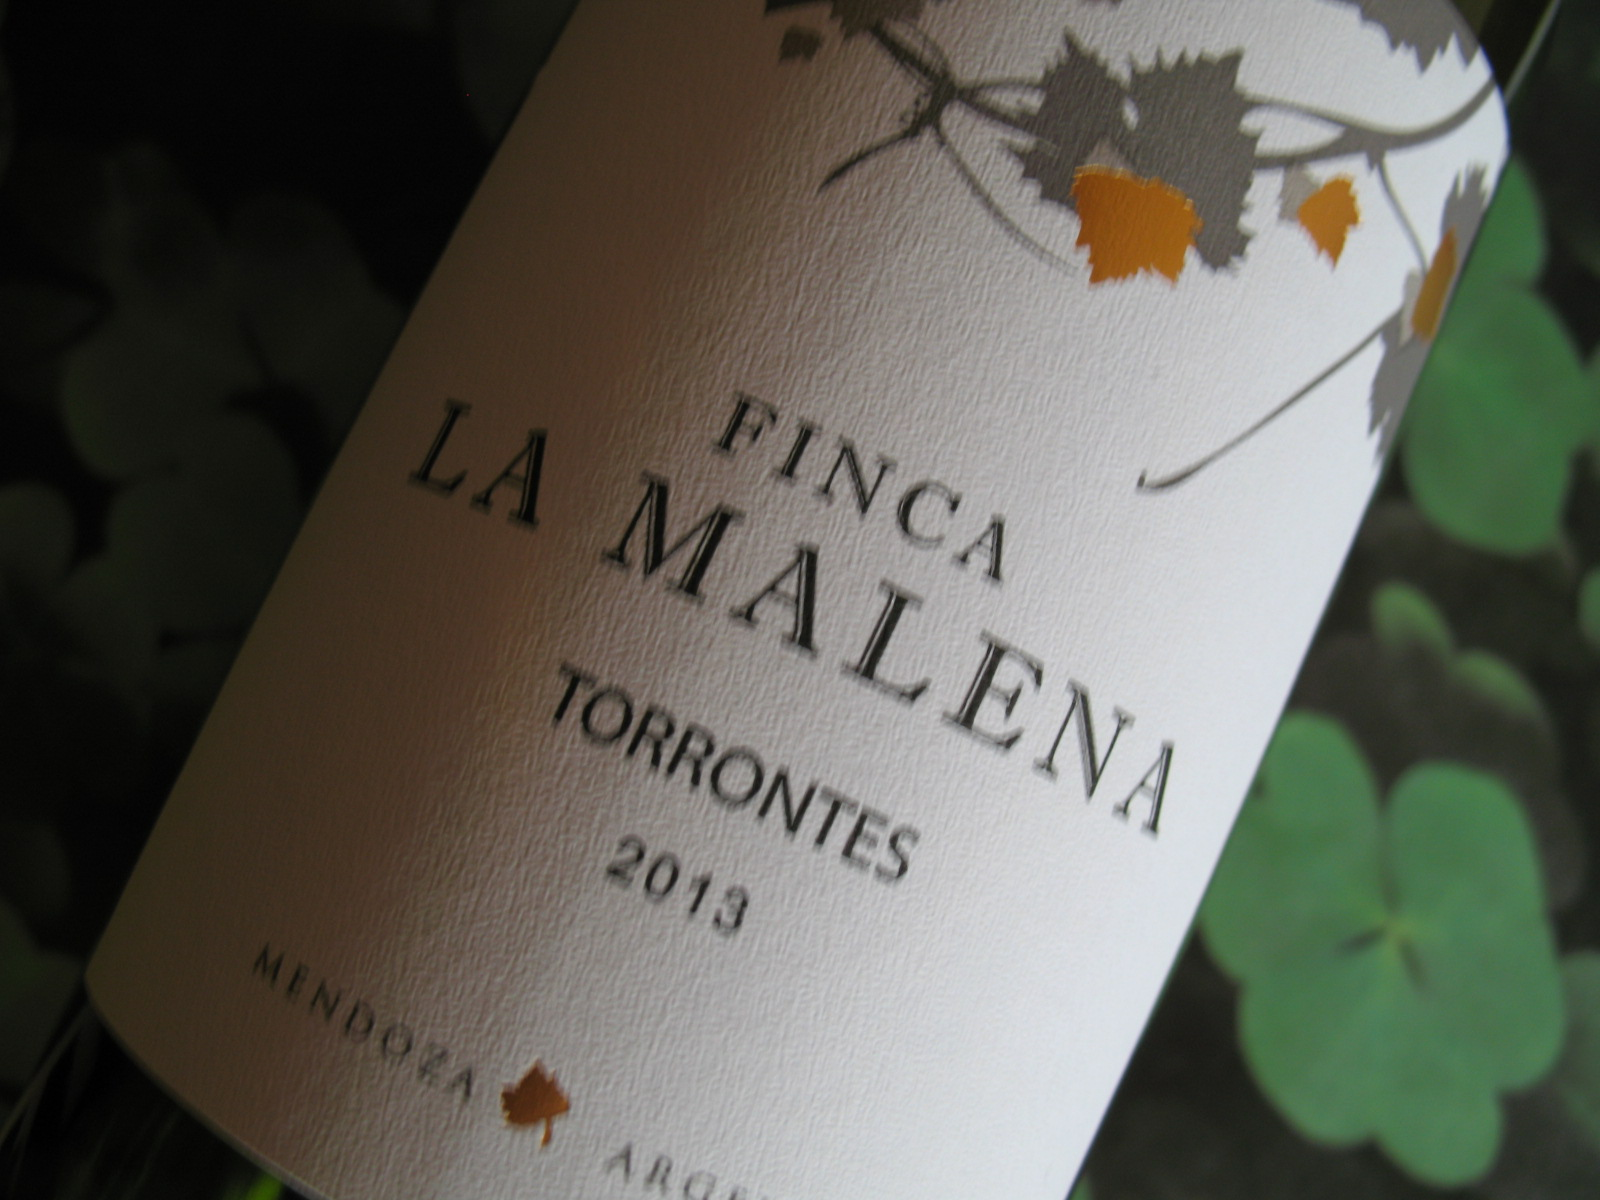 Finca La Malena 2013 Torrontes (Very Limited Quantity)